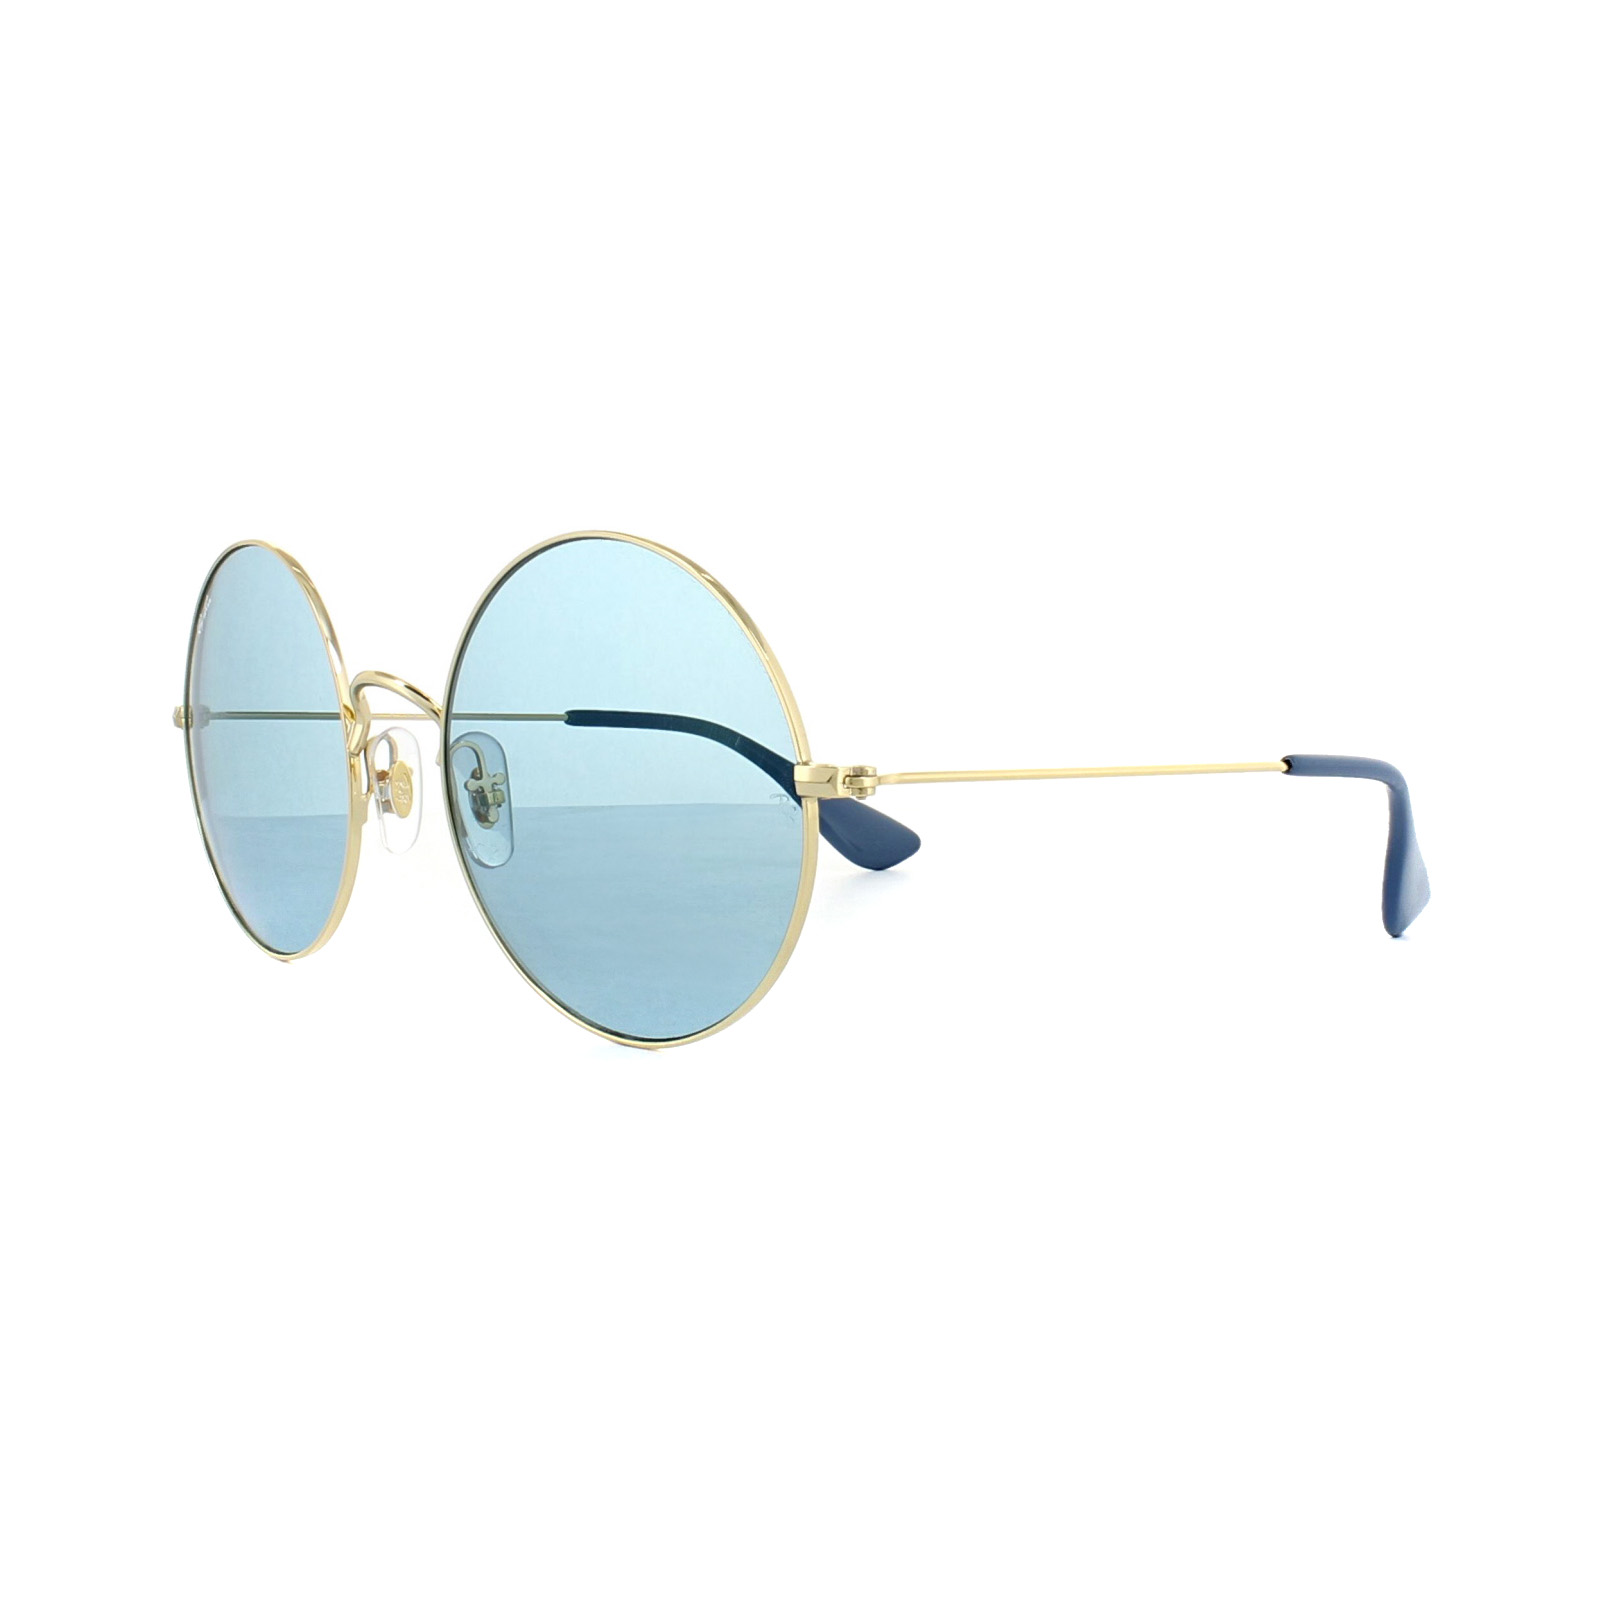 b18c2e156c Sentinel Ray-Ban Sunglasses Ja-Jo 3592 001 F7 Gold Light Blue